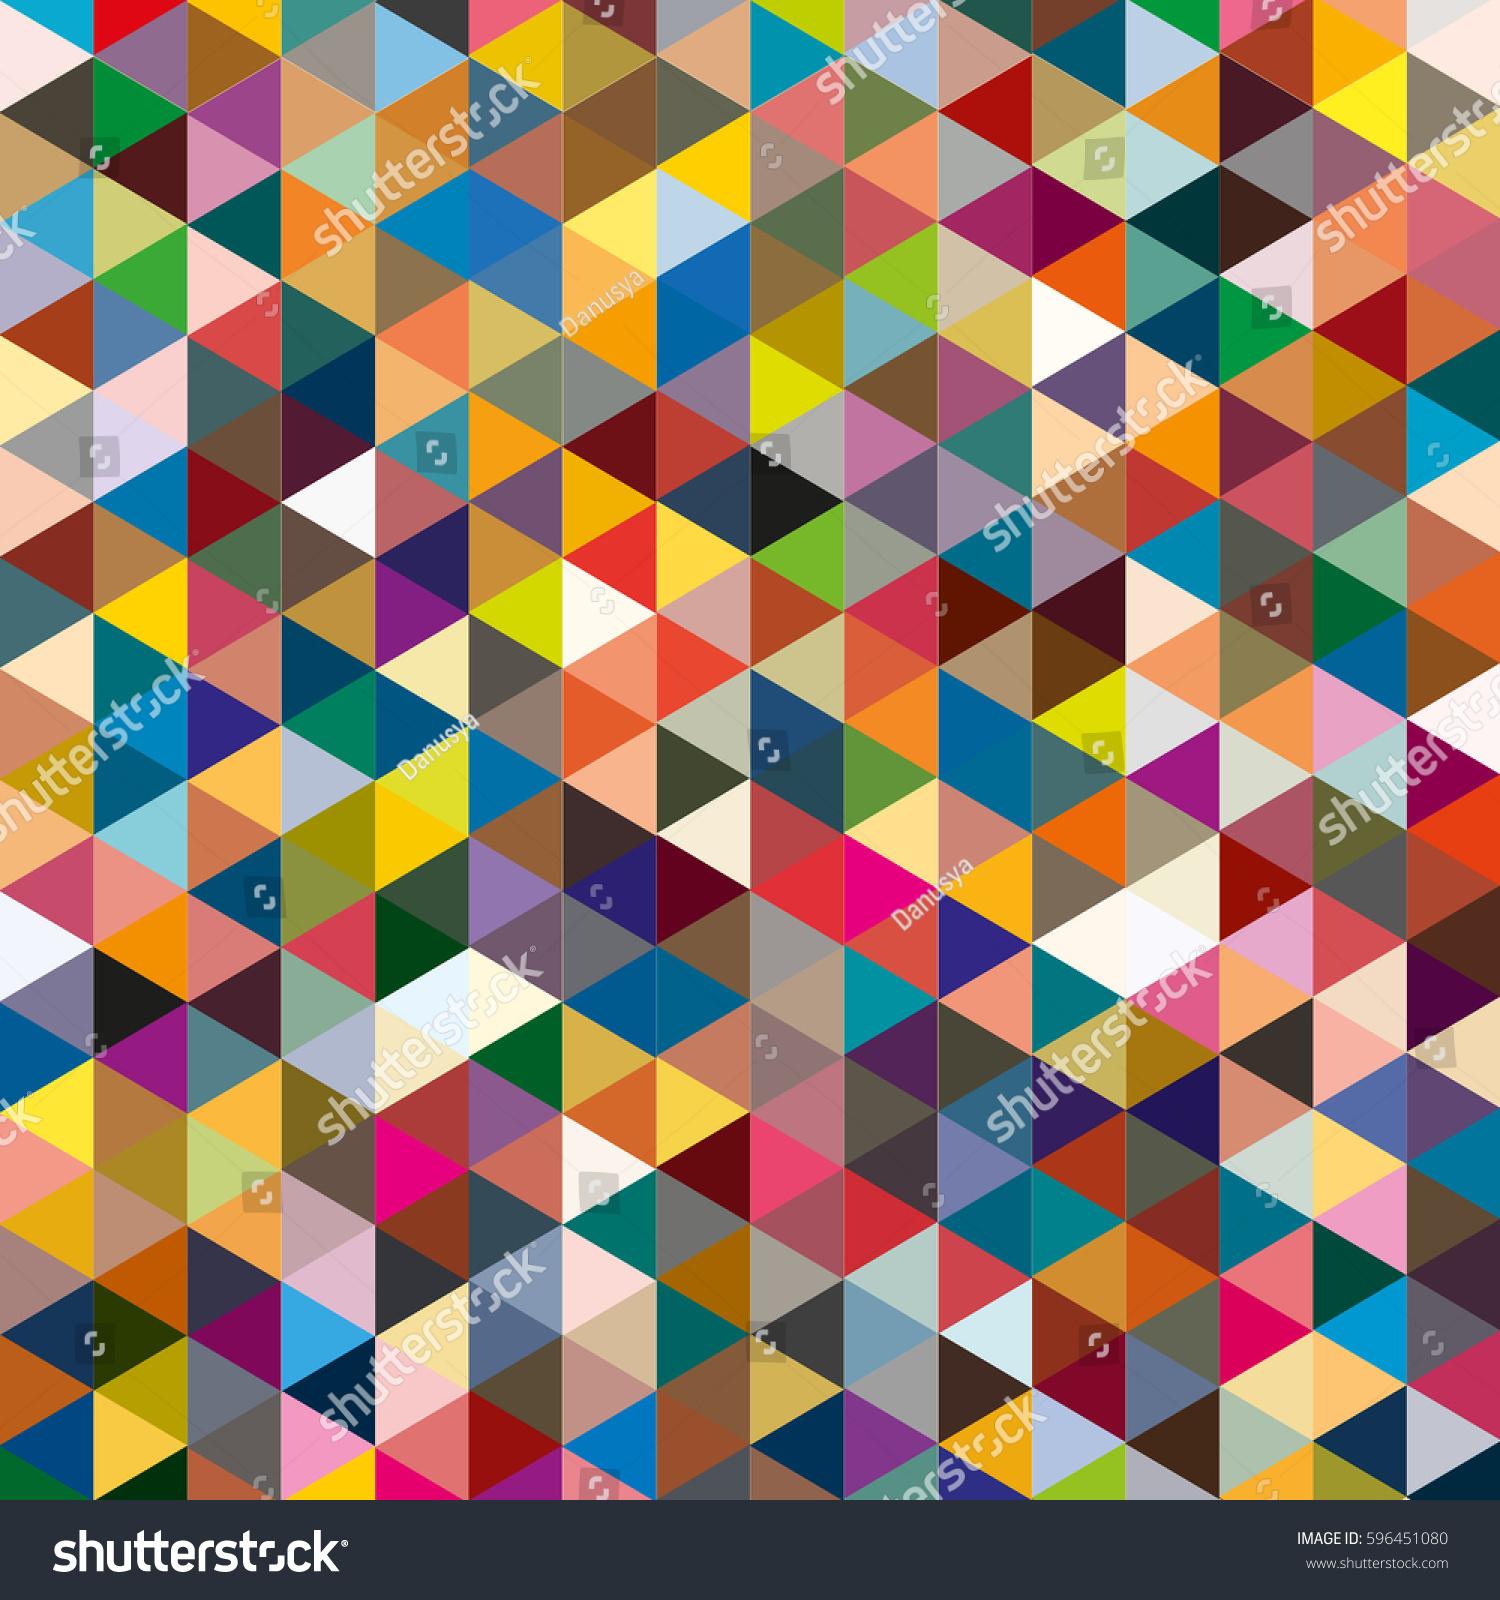 colorful geometric pattern wallpaper